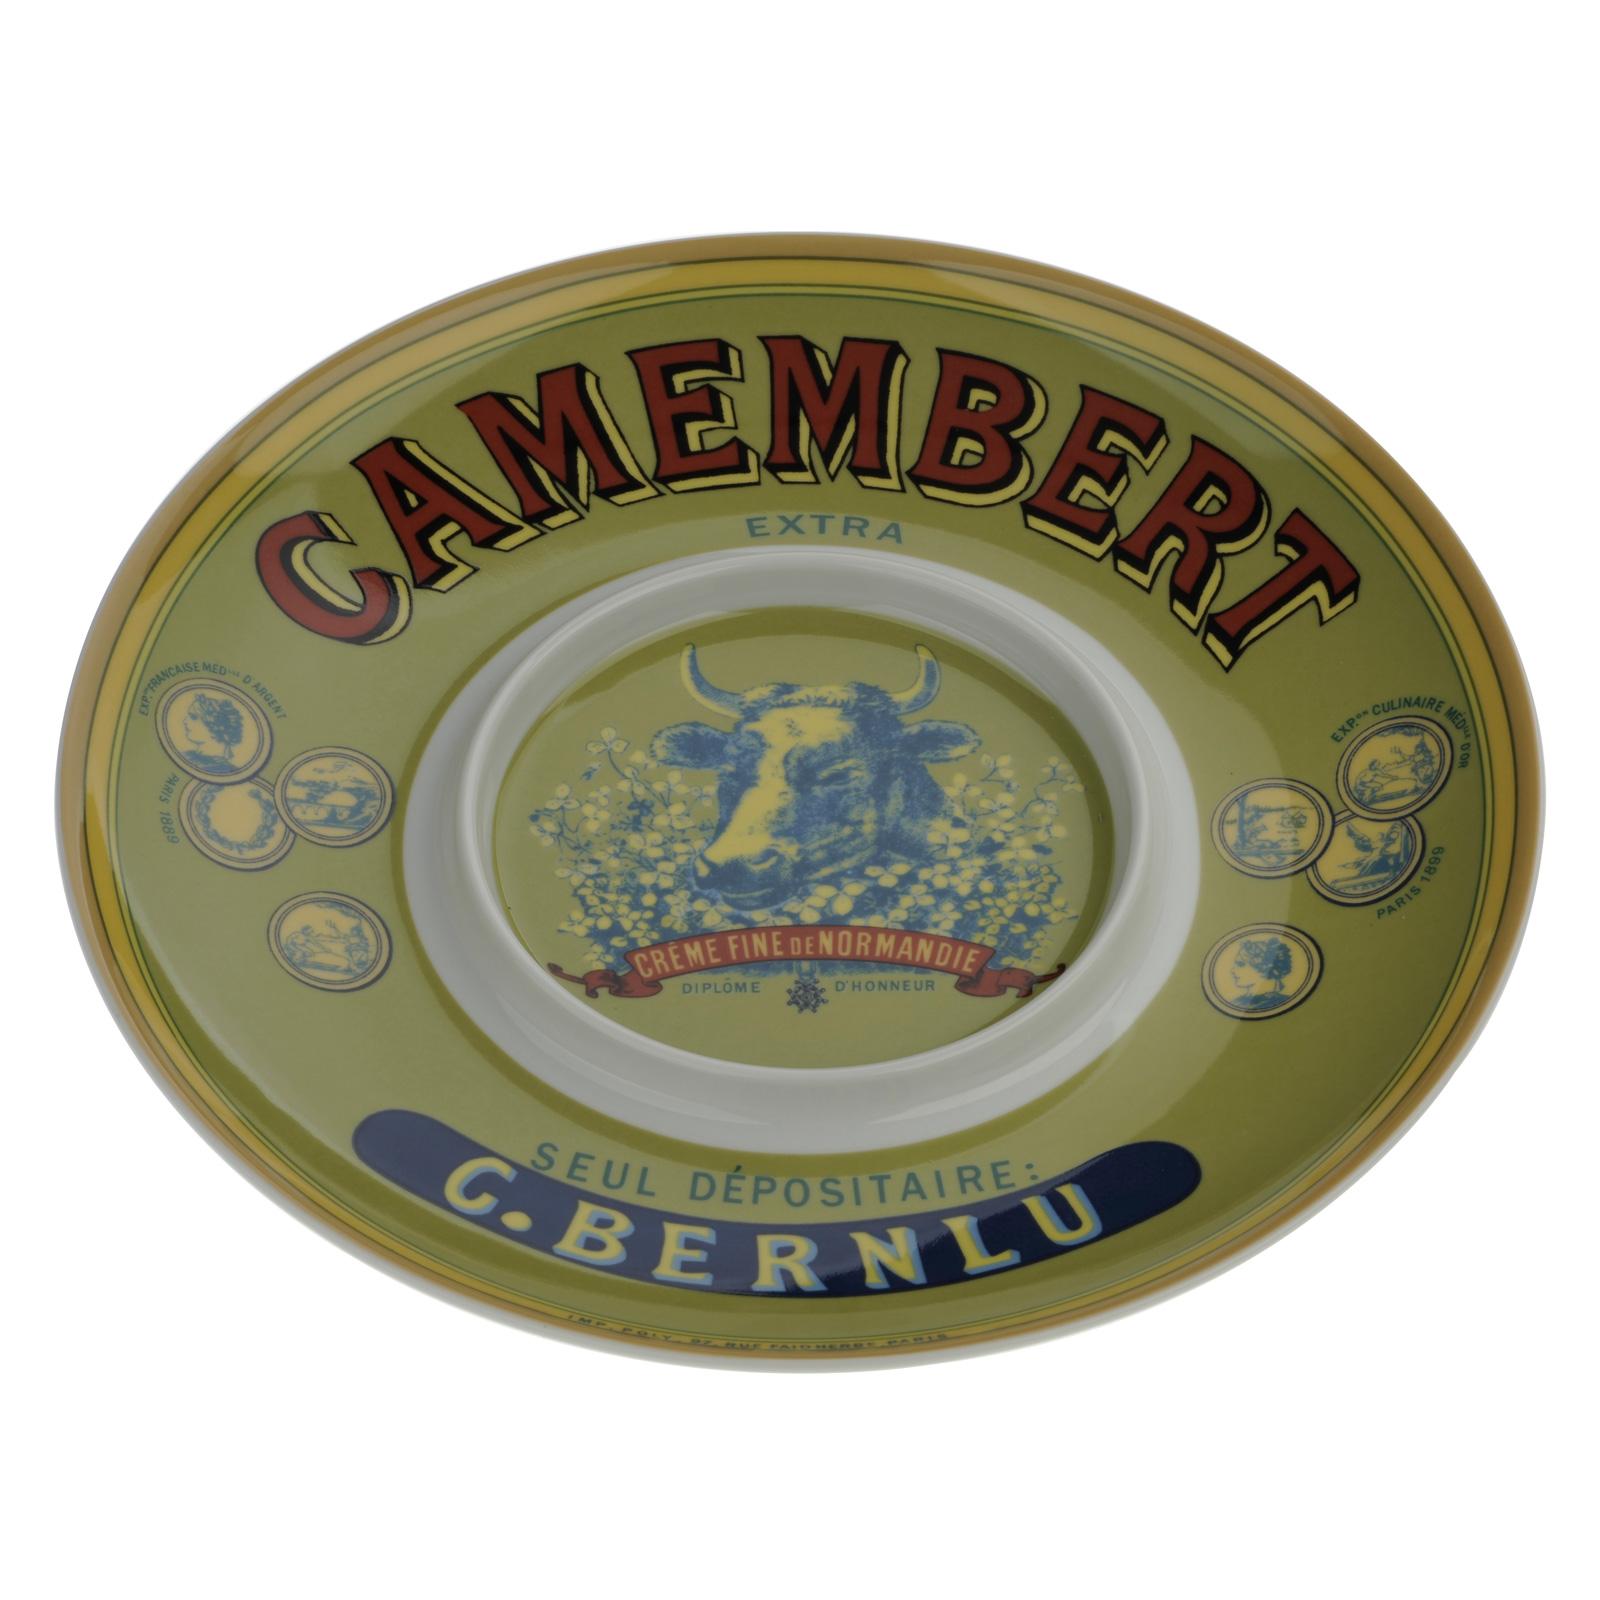 Cow's Head Camembert Baker Platter